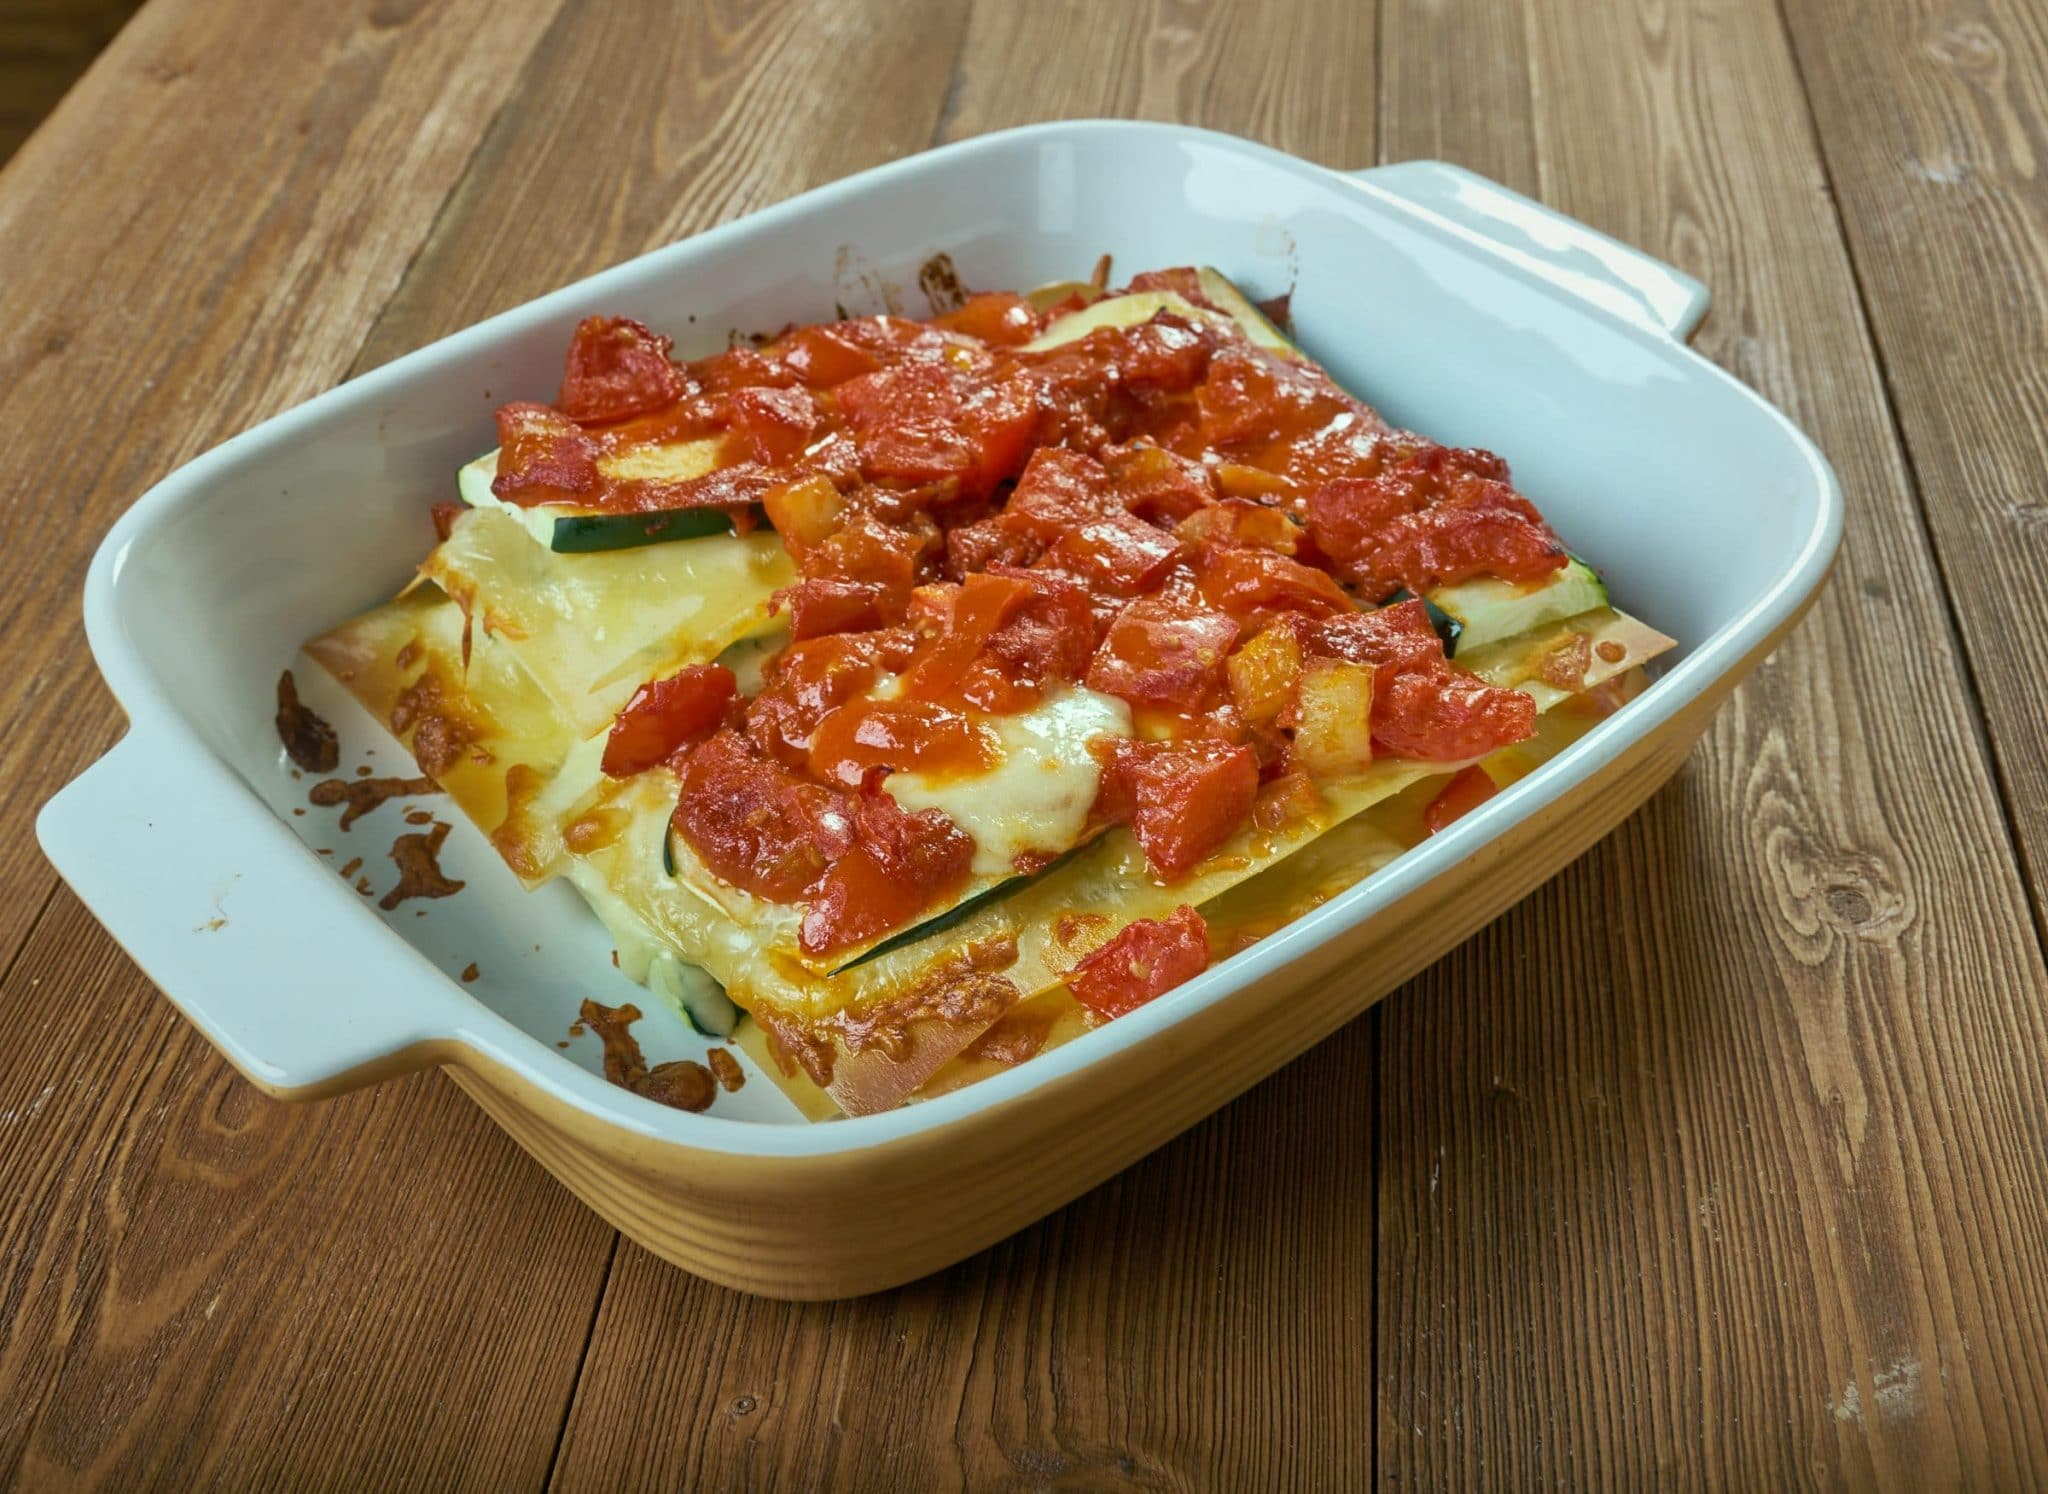 Zucchini Lasagna top side view in a tan casserole dish